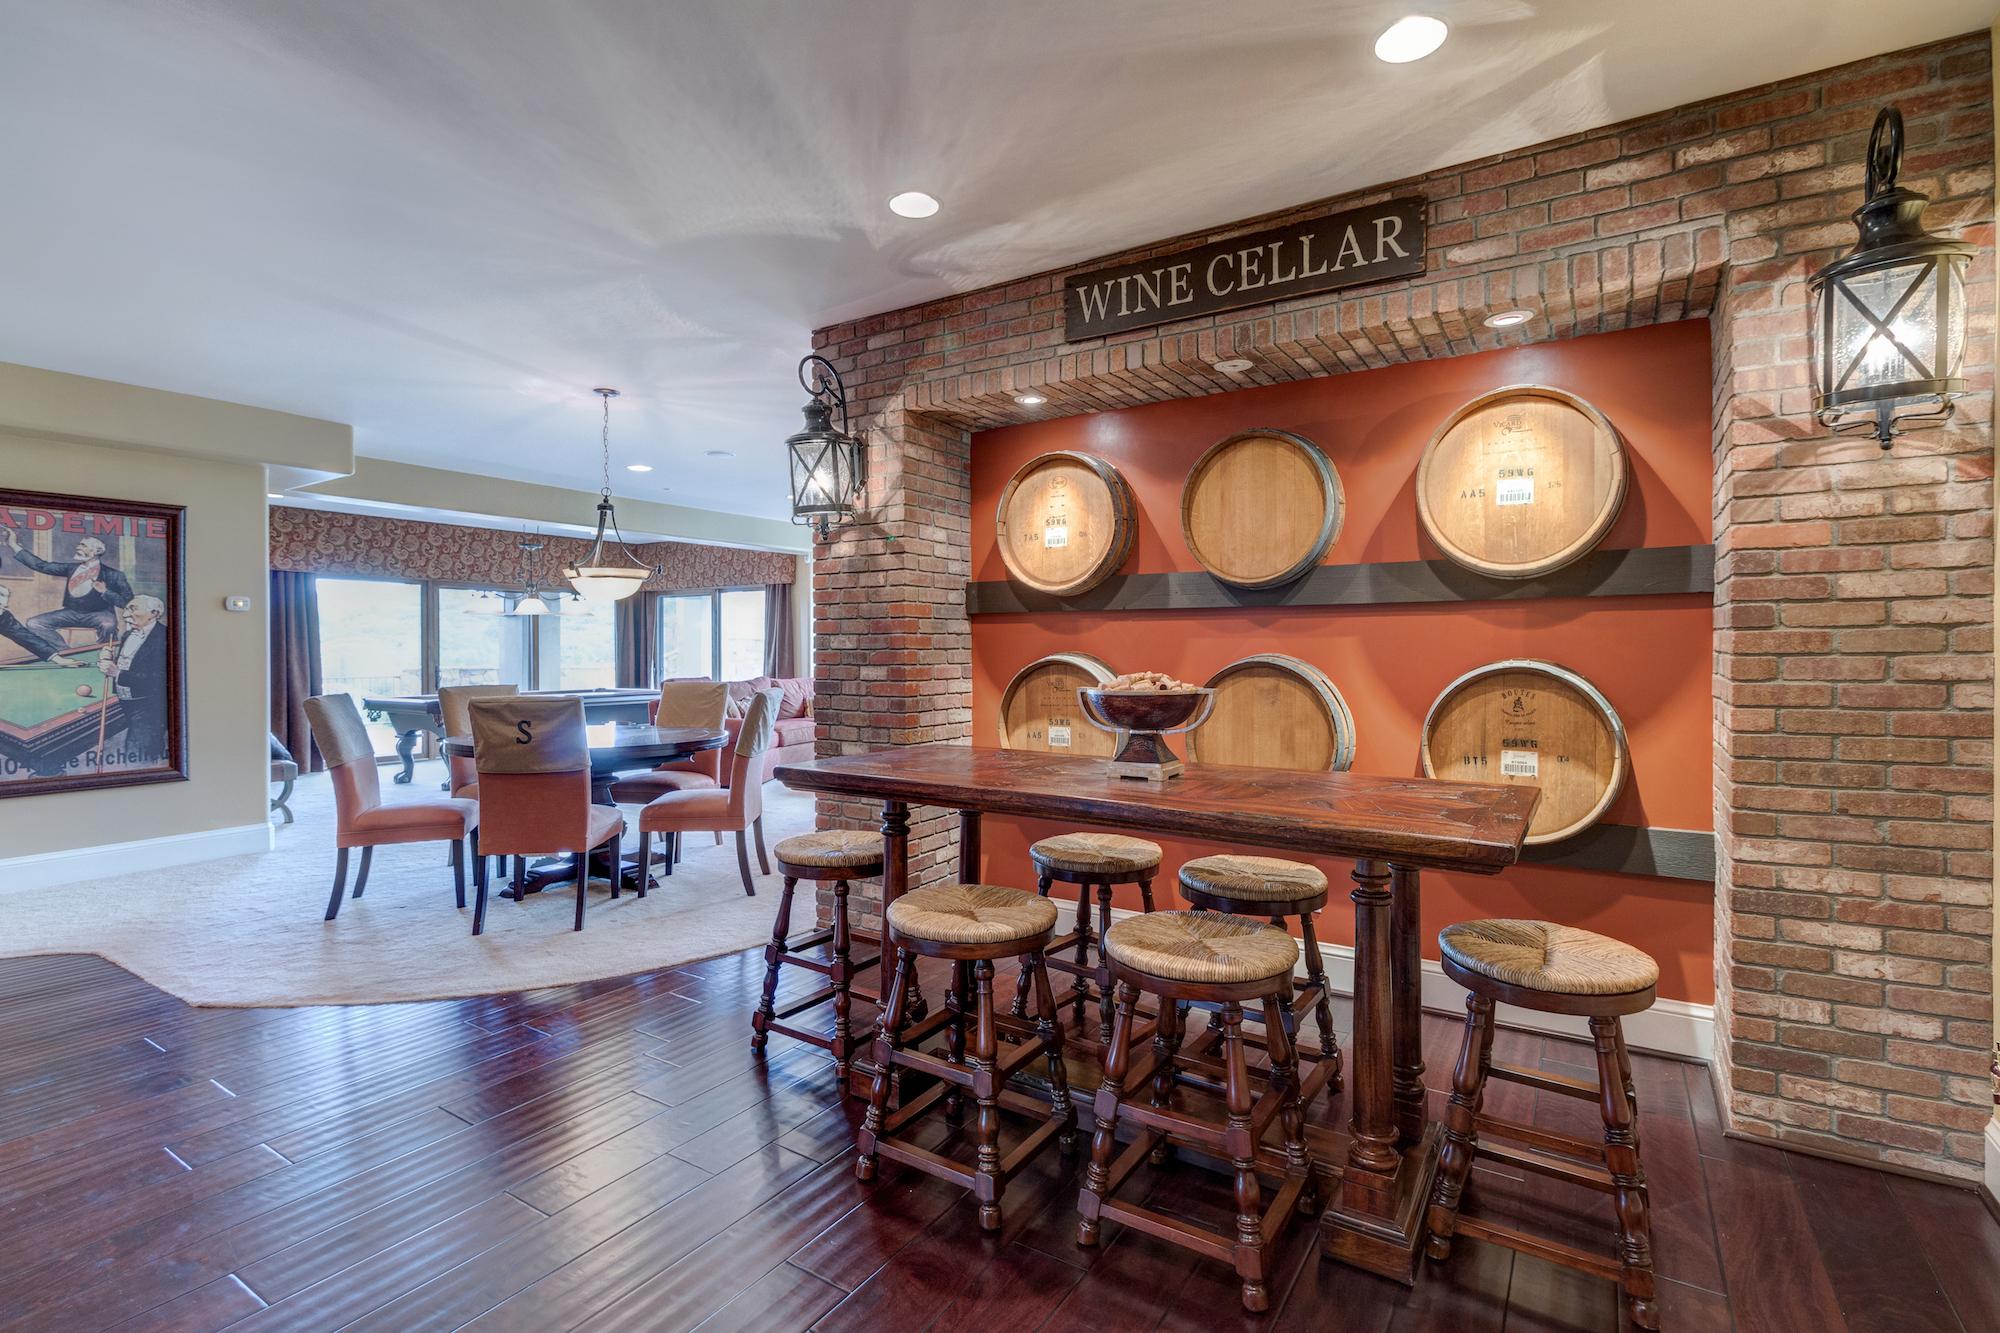 019-Family room in basement w wet bar and wine tasting area.jpg